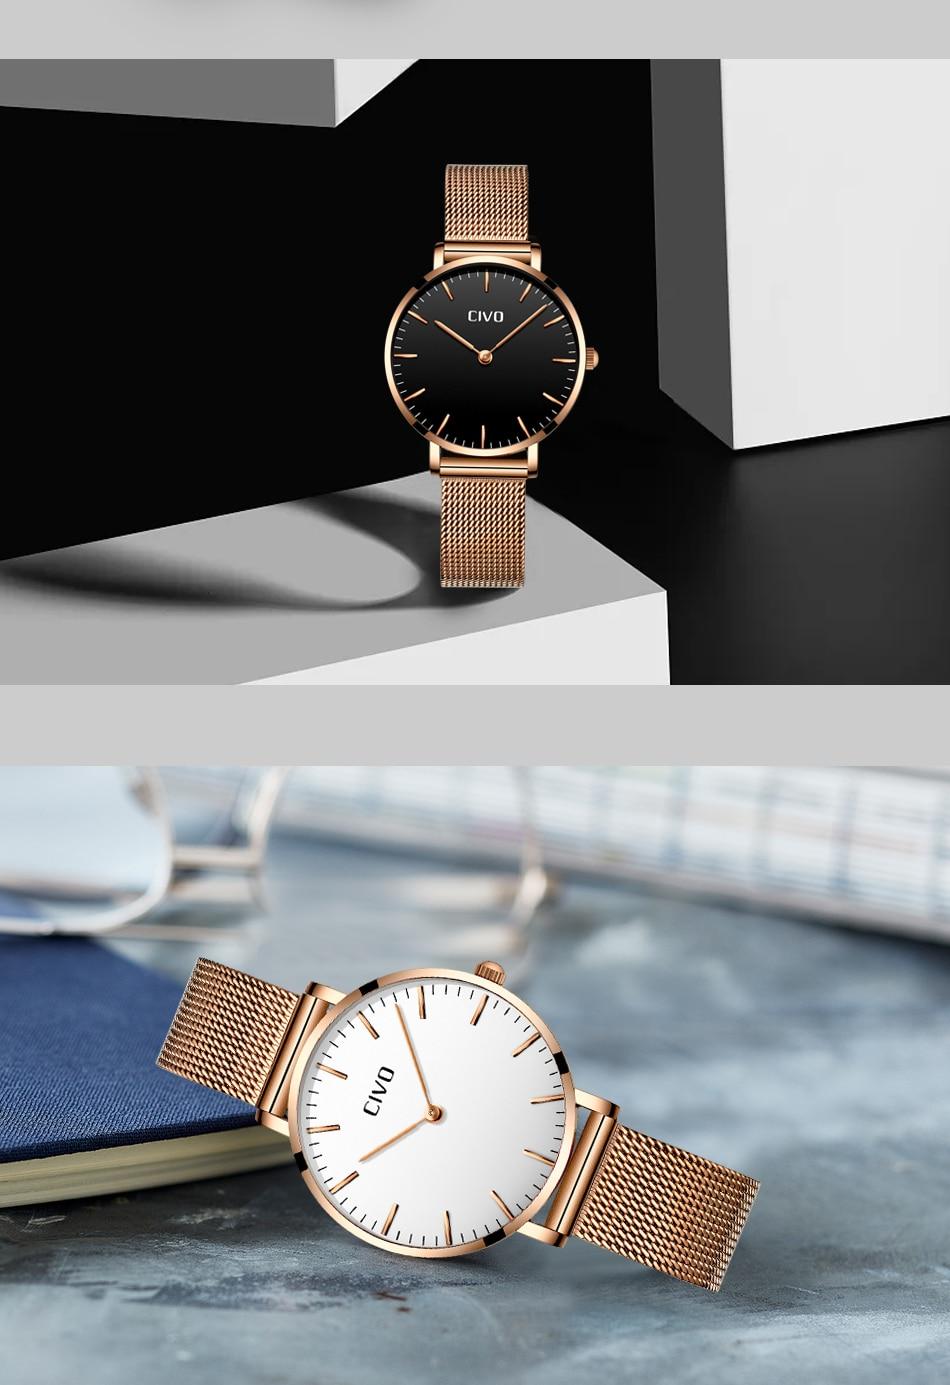 Civo luxo bling senhoras relógio feminino zegarek